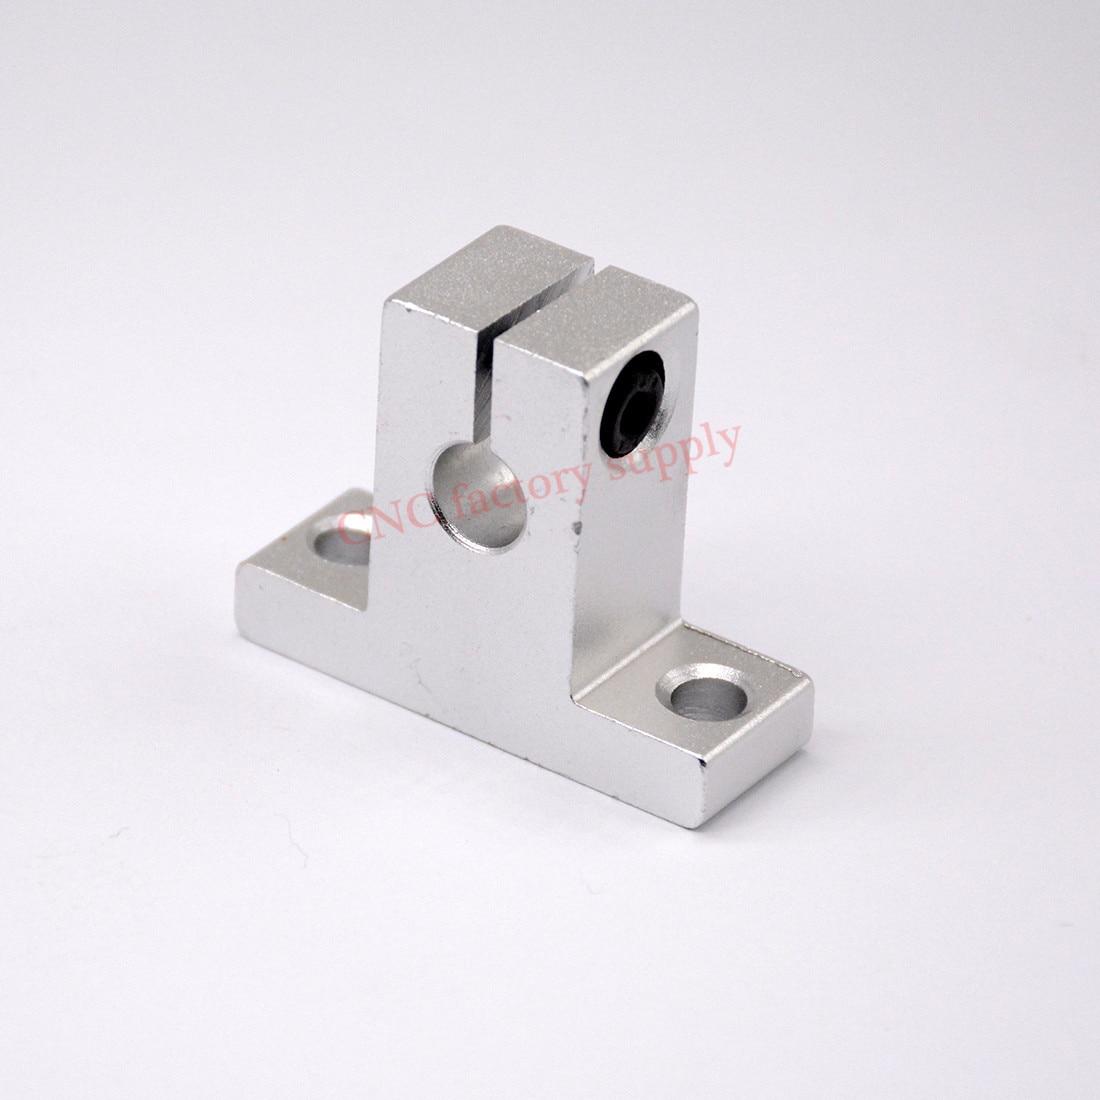 10pcs/lot Free Shipping SK10 10mm linear bearing rail shaft support XYZ Table CNC Router SH10A стоимость